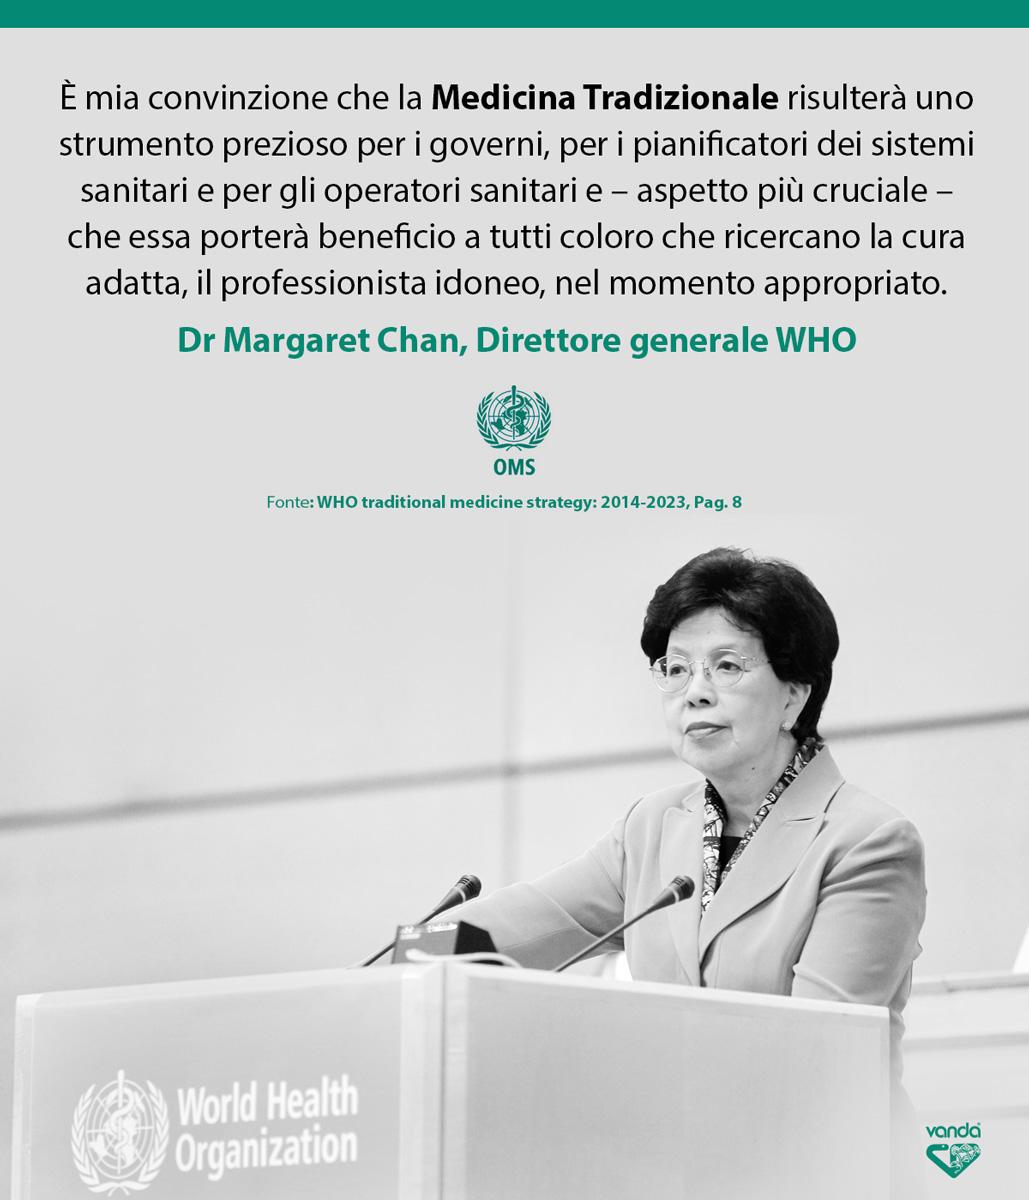 Margaret Chan Direttore generale WHO